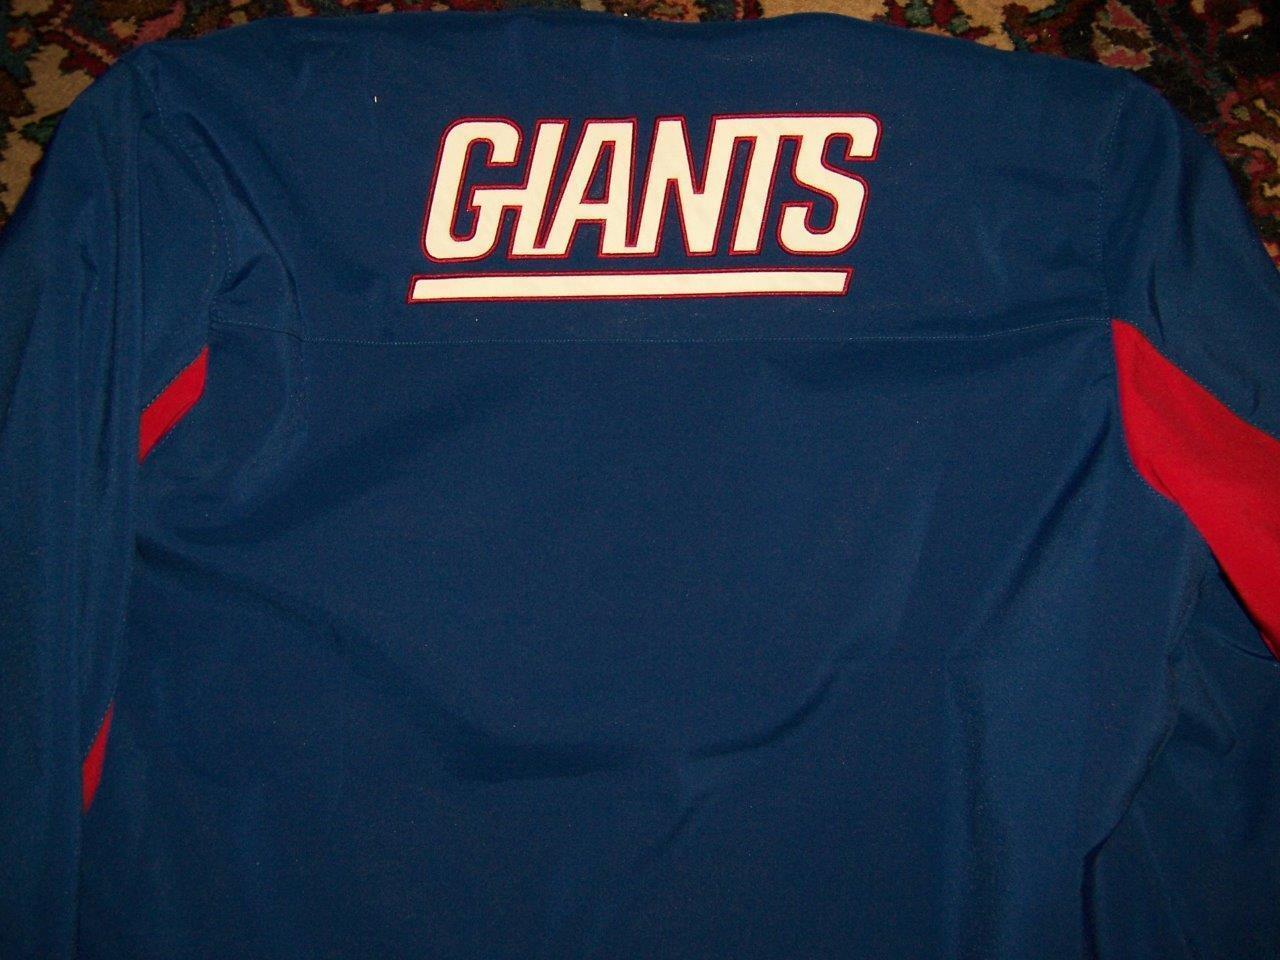 Para Hombre Chaqueta Chaqueta Chaqueta Ropa de equipo de NFL Gigantes GIII Apparel Group Tamaño Grande f280ff